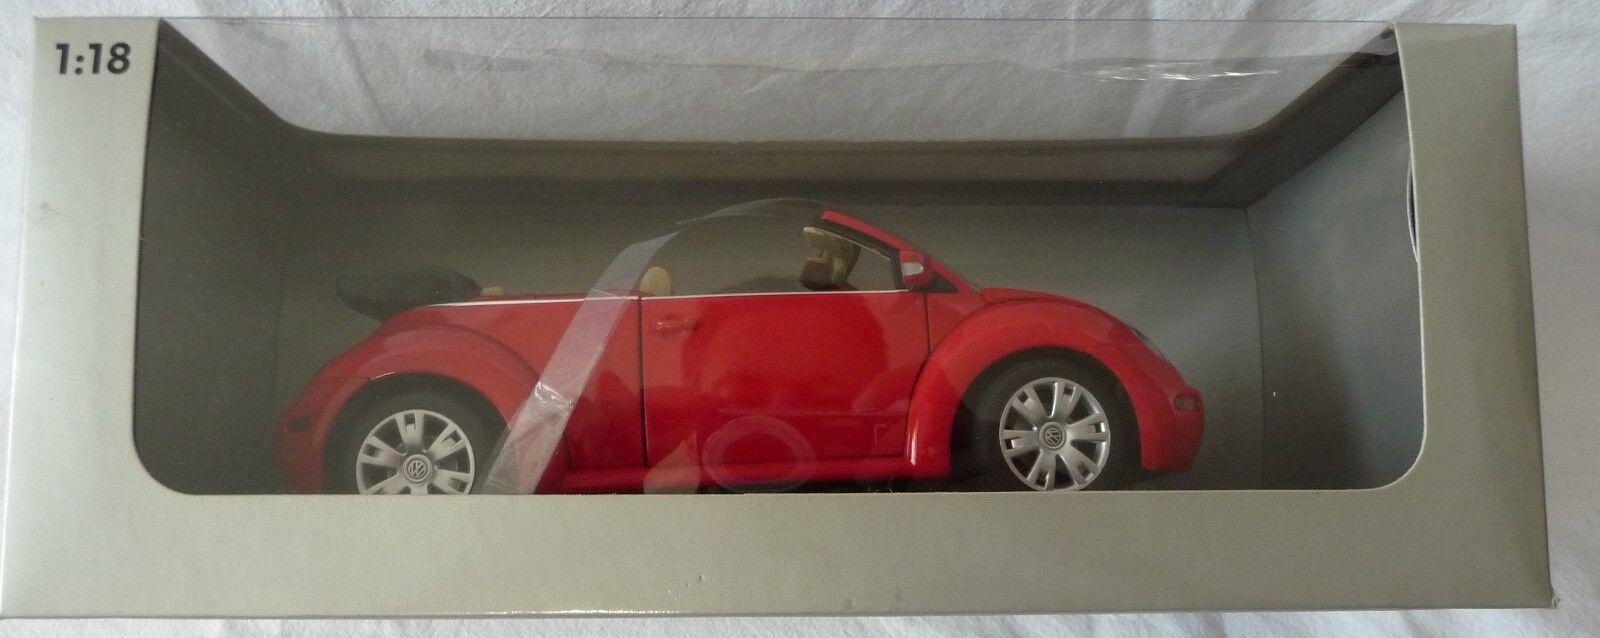 AUTOart Gate 1 18   VW New Beetle Cabrio Rot uni (01283), OVP